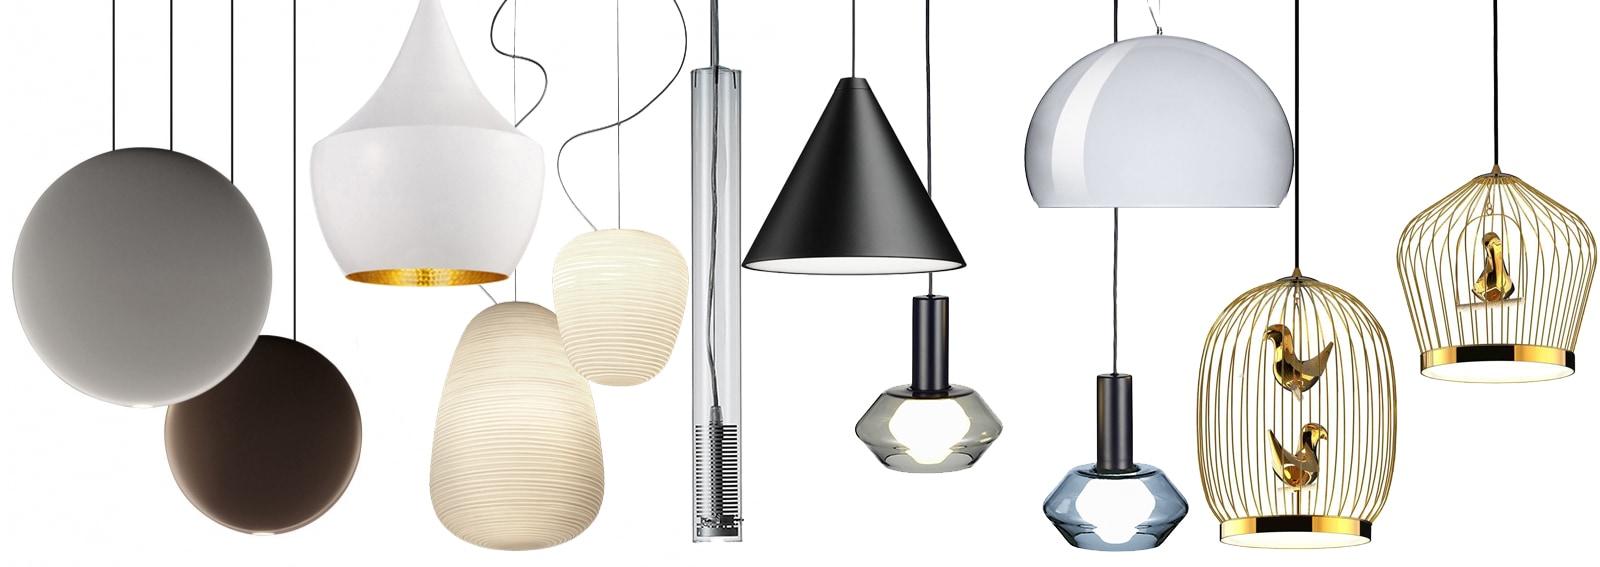 cover-lampade-a-sospensione-desktop